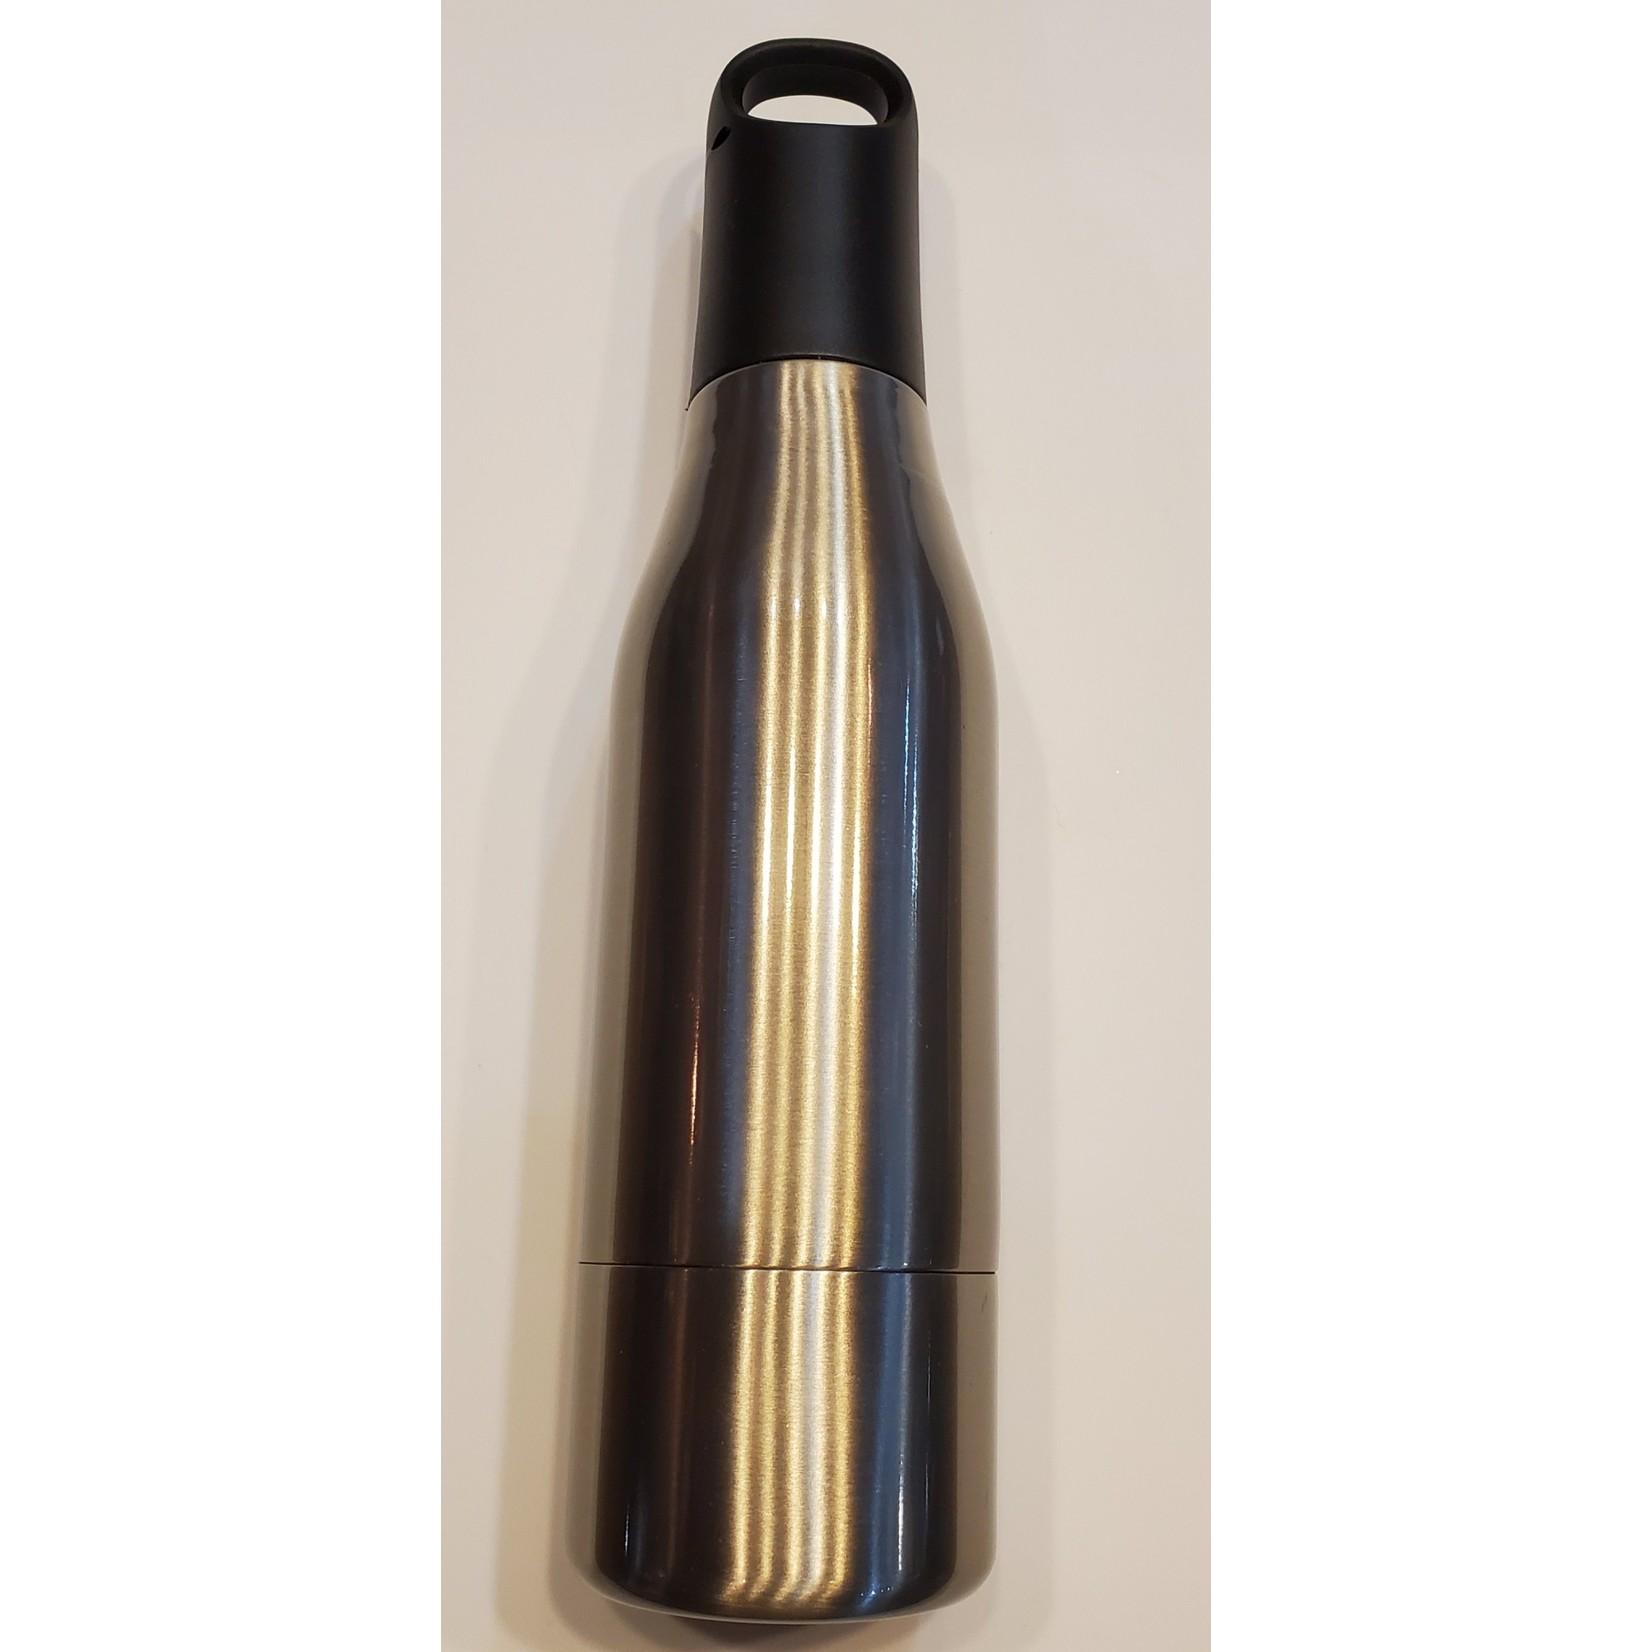 Nicole Brayden Gifts M2O-Silver SS Bottle Cooler